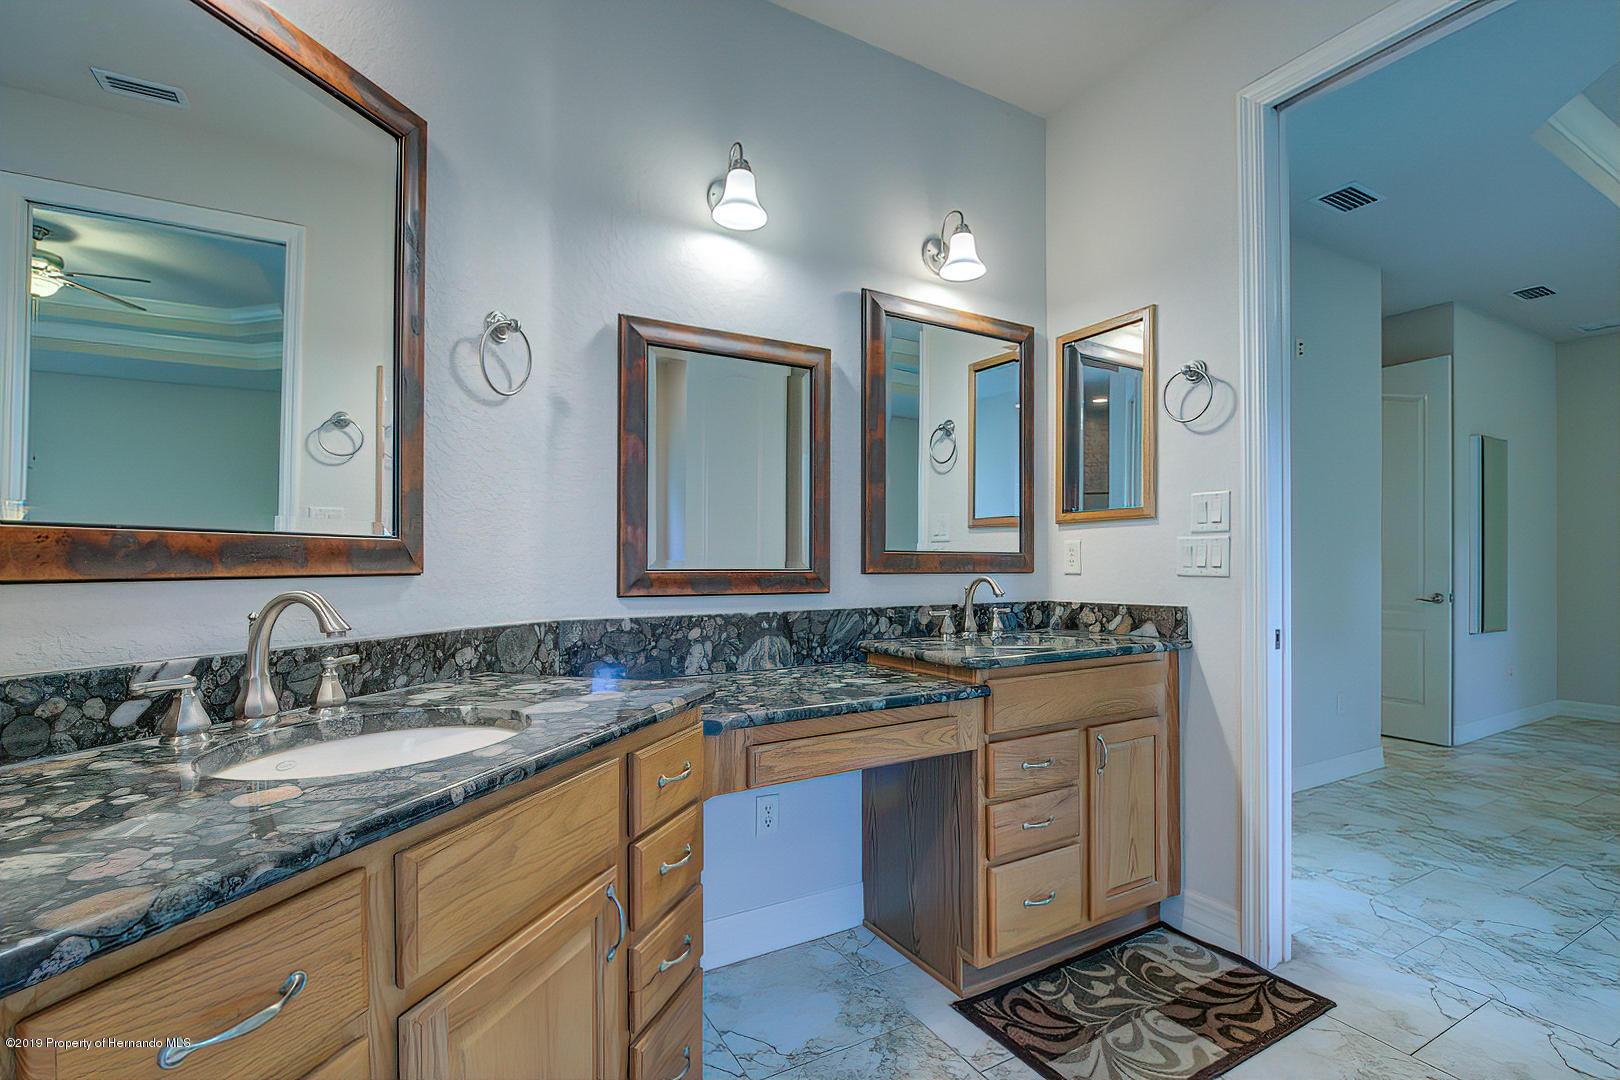 98 Daisy Street, Homosassa, Florida 34446, 3 Bedrooms Bedrooms, ,2 BathroomsBathrooms,Residential,For Sale,Daisy,2203789